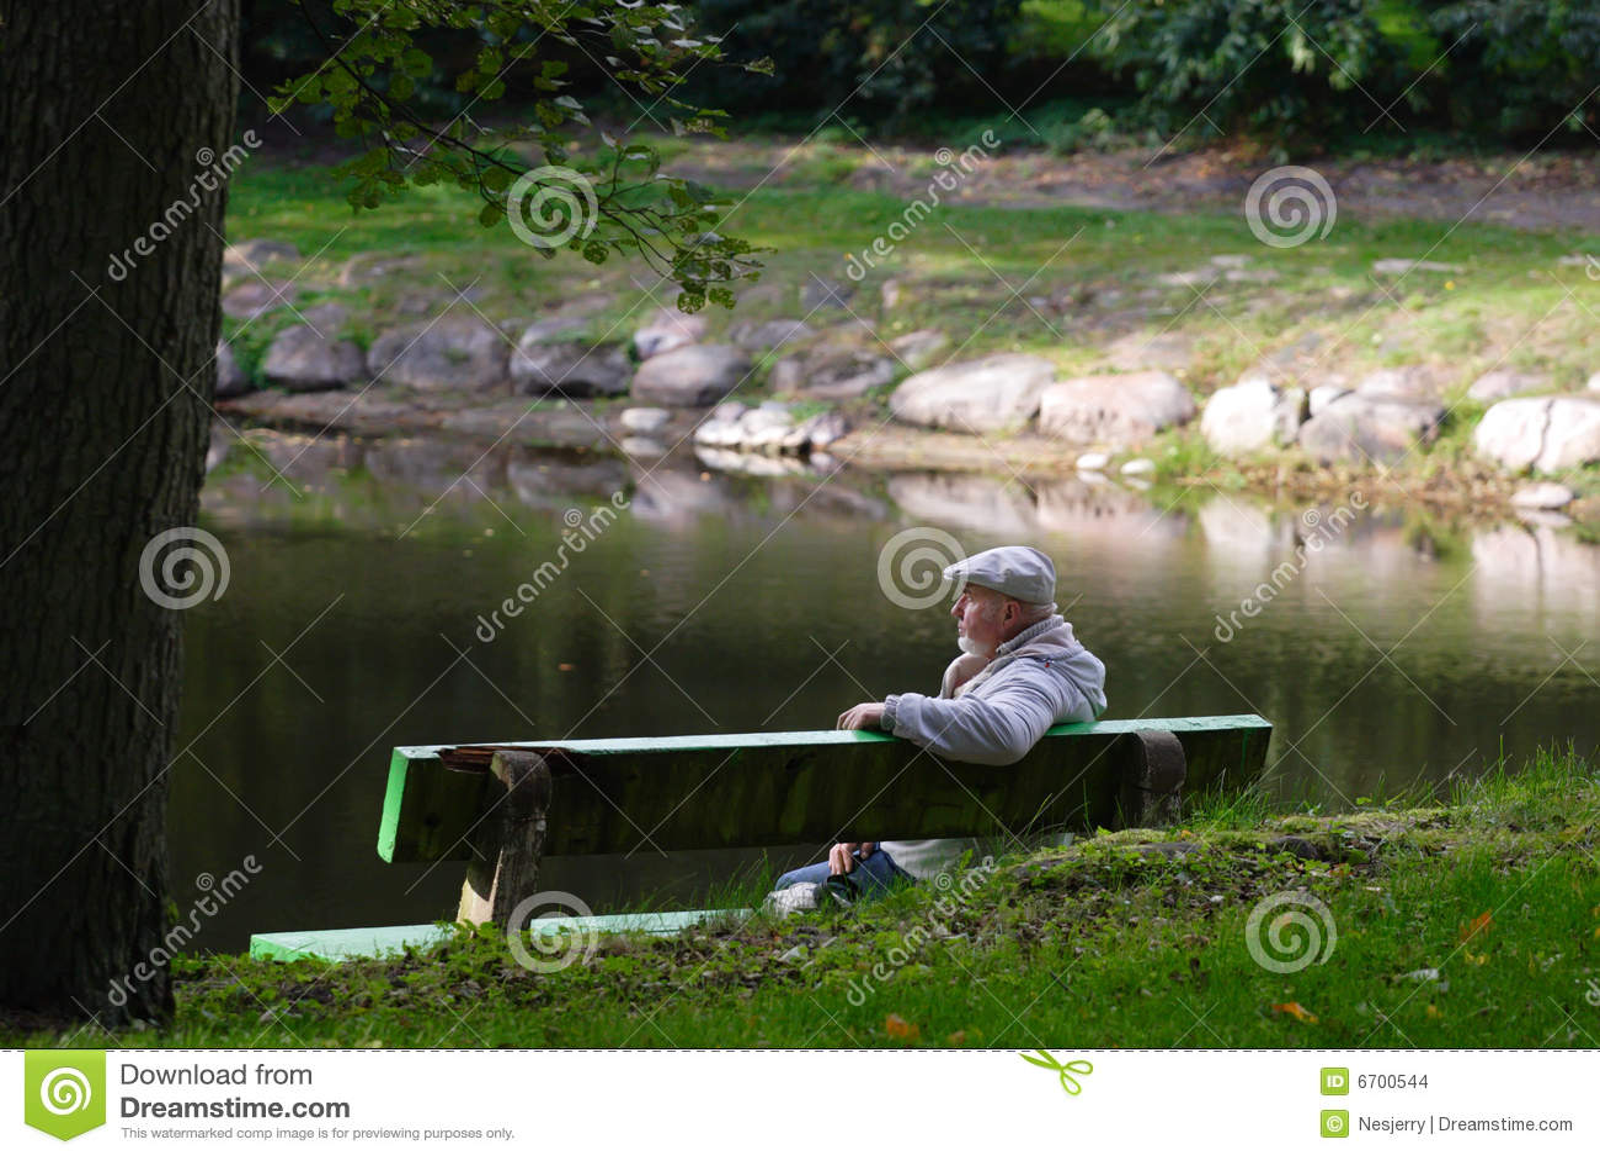 Senior men sitting on a bench